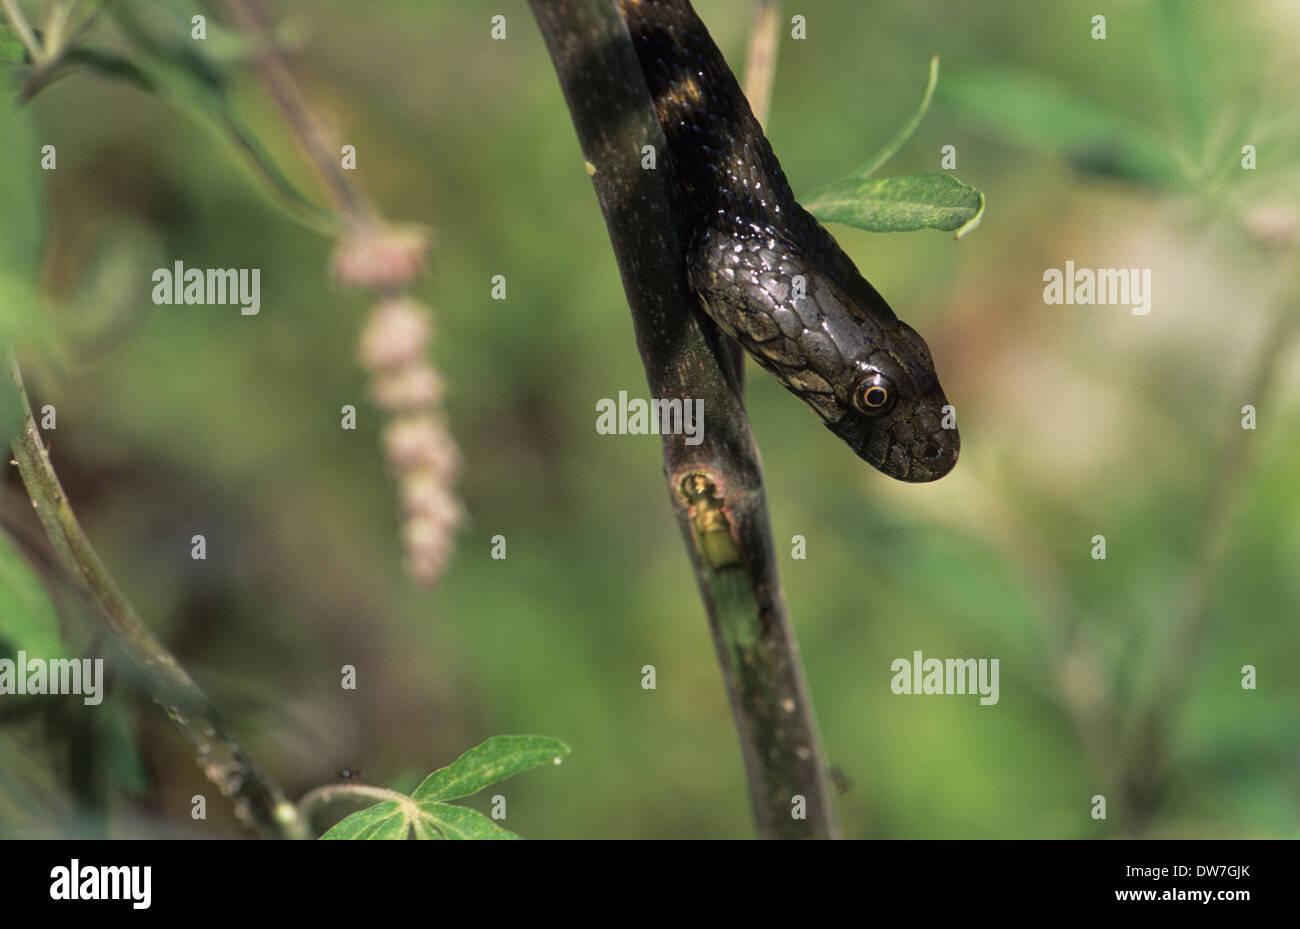 DICE SNAKE (Natrix tessellata) Lesbos Greece - Stock Image